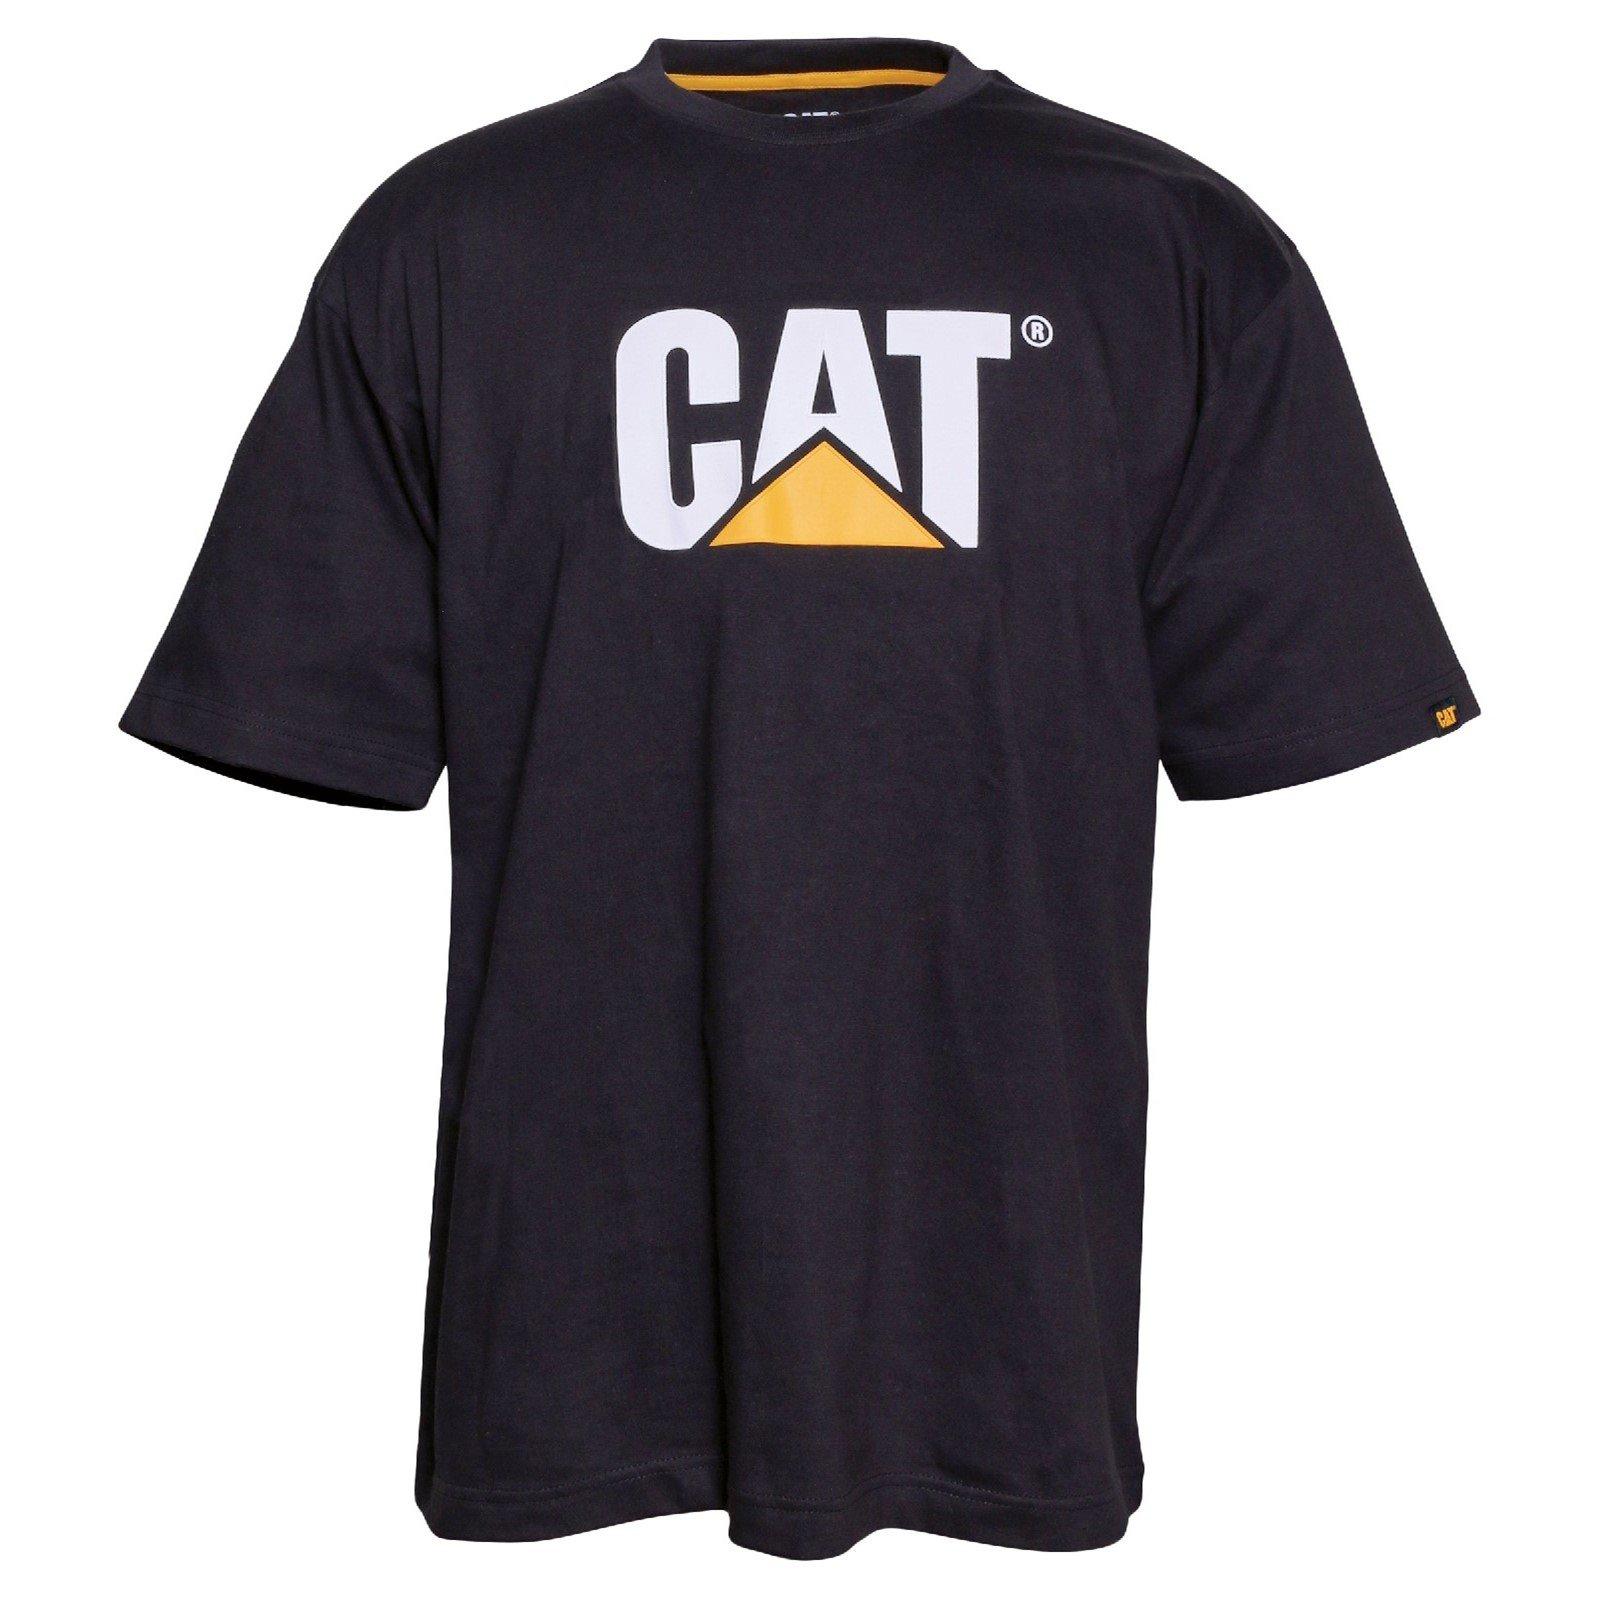 Caterpillar Men's Trademark Logo T-Shirt Various Colours 25301-42086 - Black X